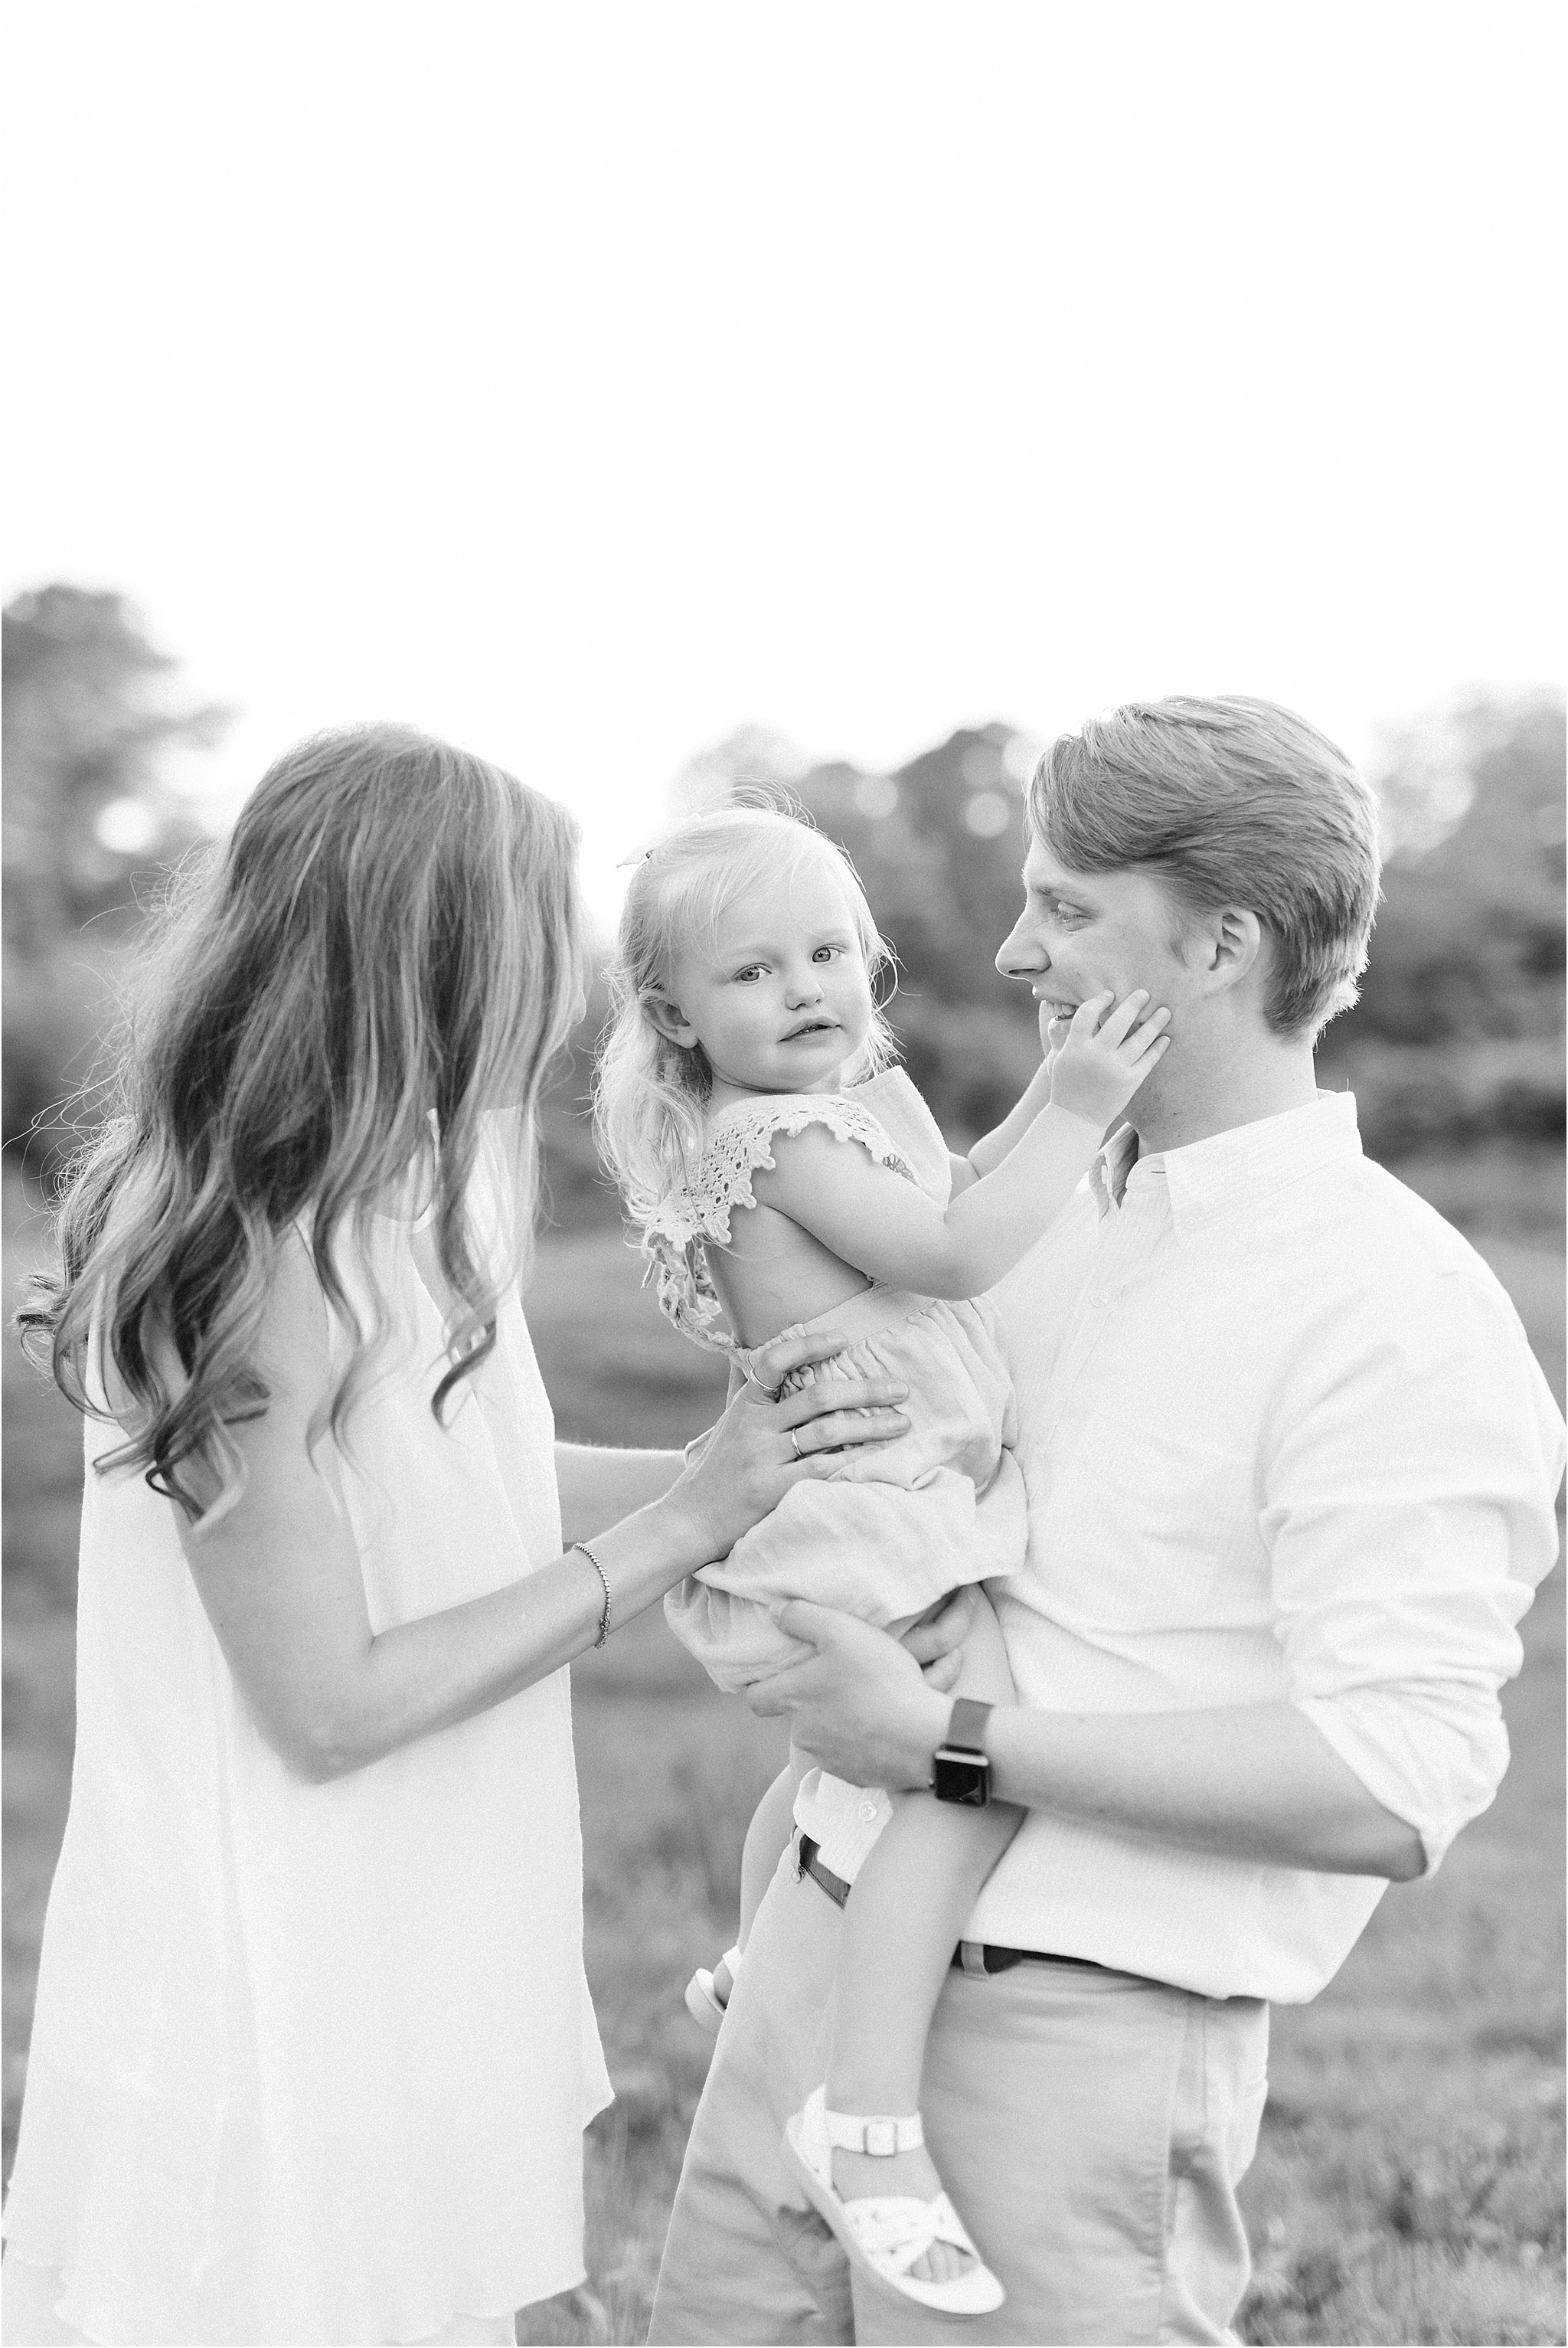 Rachel_Bond_Birmingham_AL-family-photography_0017.jpg